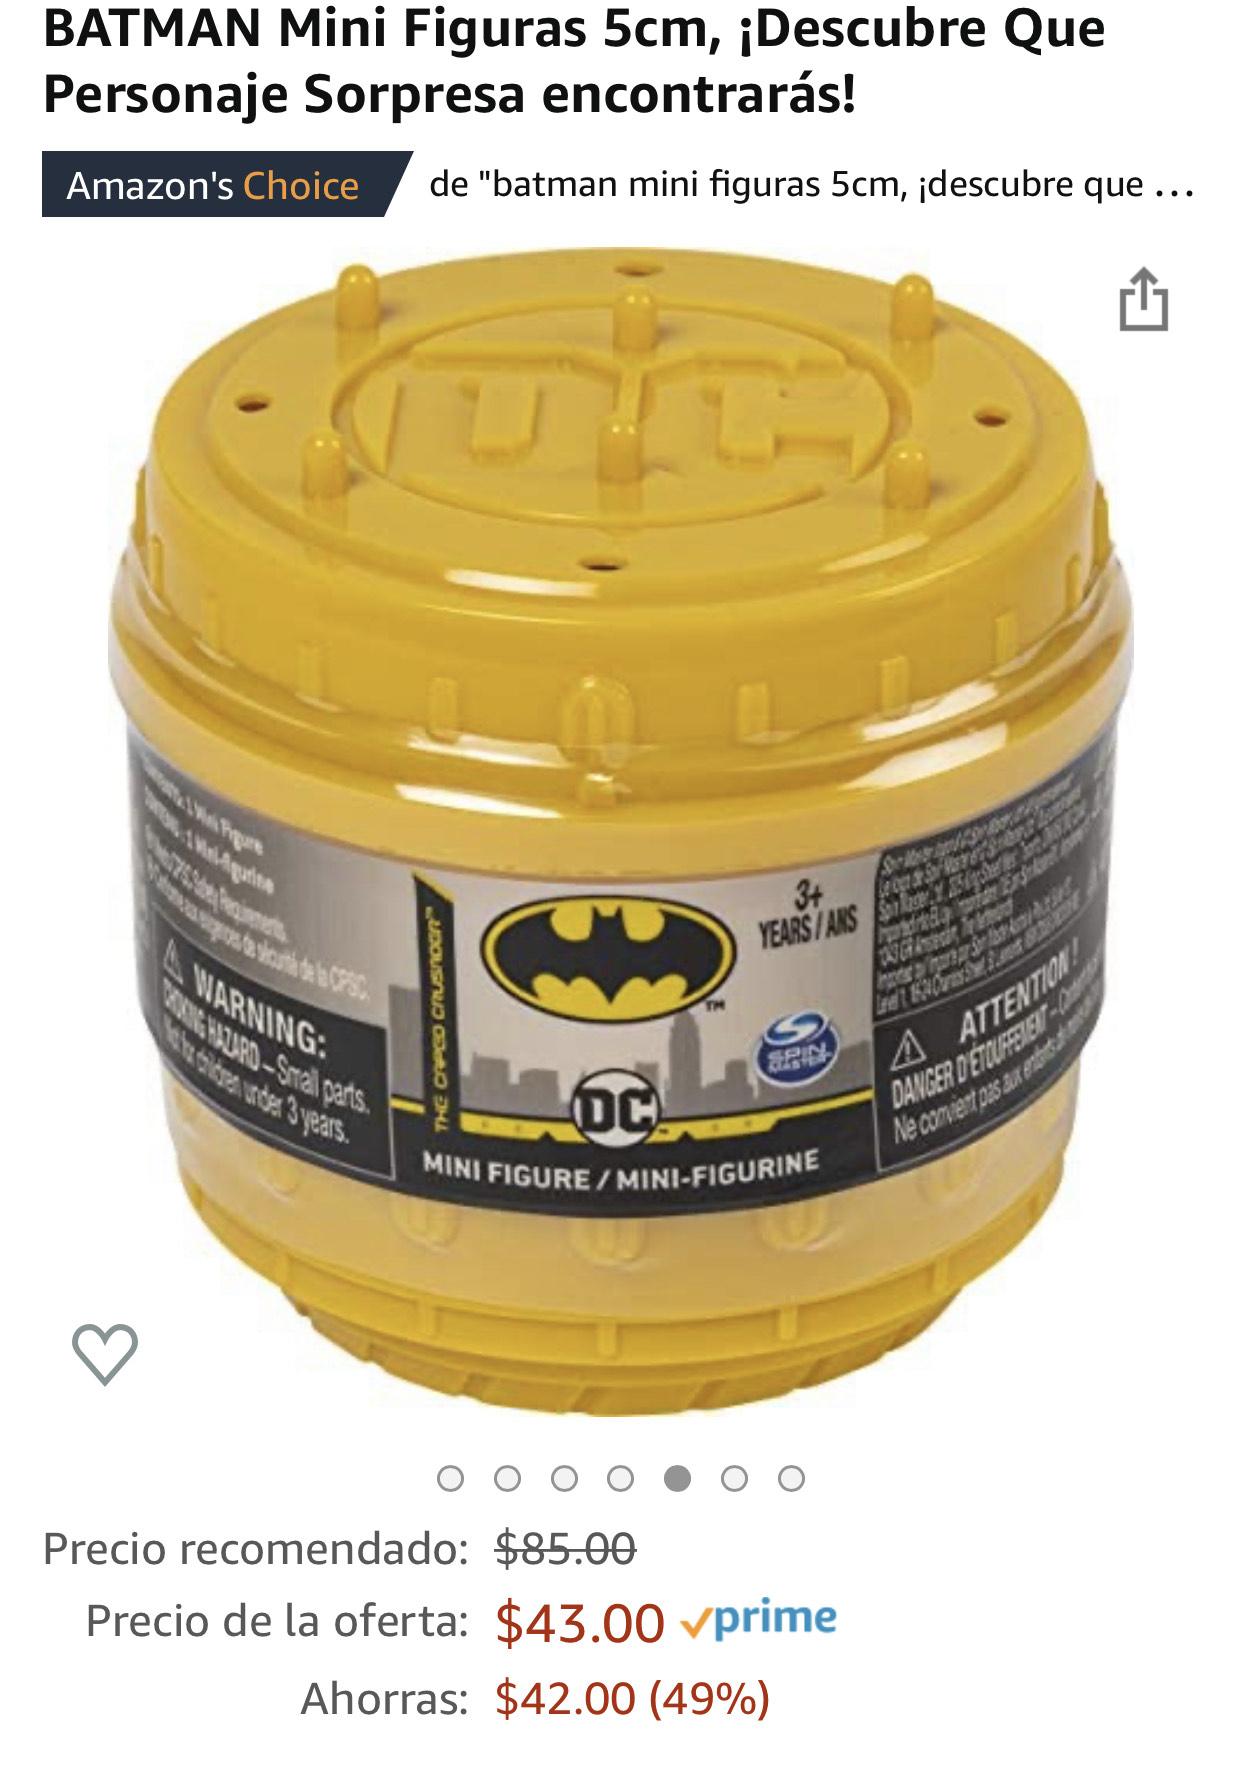 Amazonmx y Liverpool: mini figuras Batman, personaje sorpresa